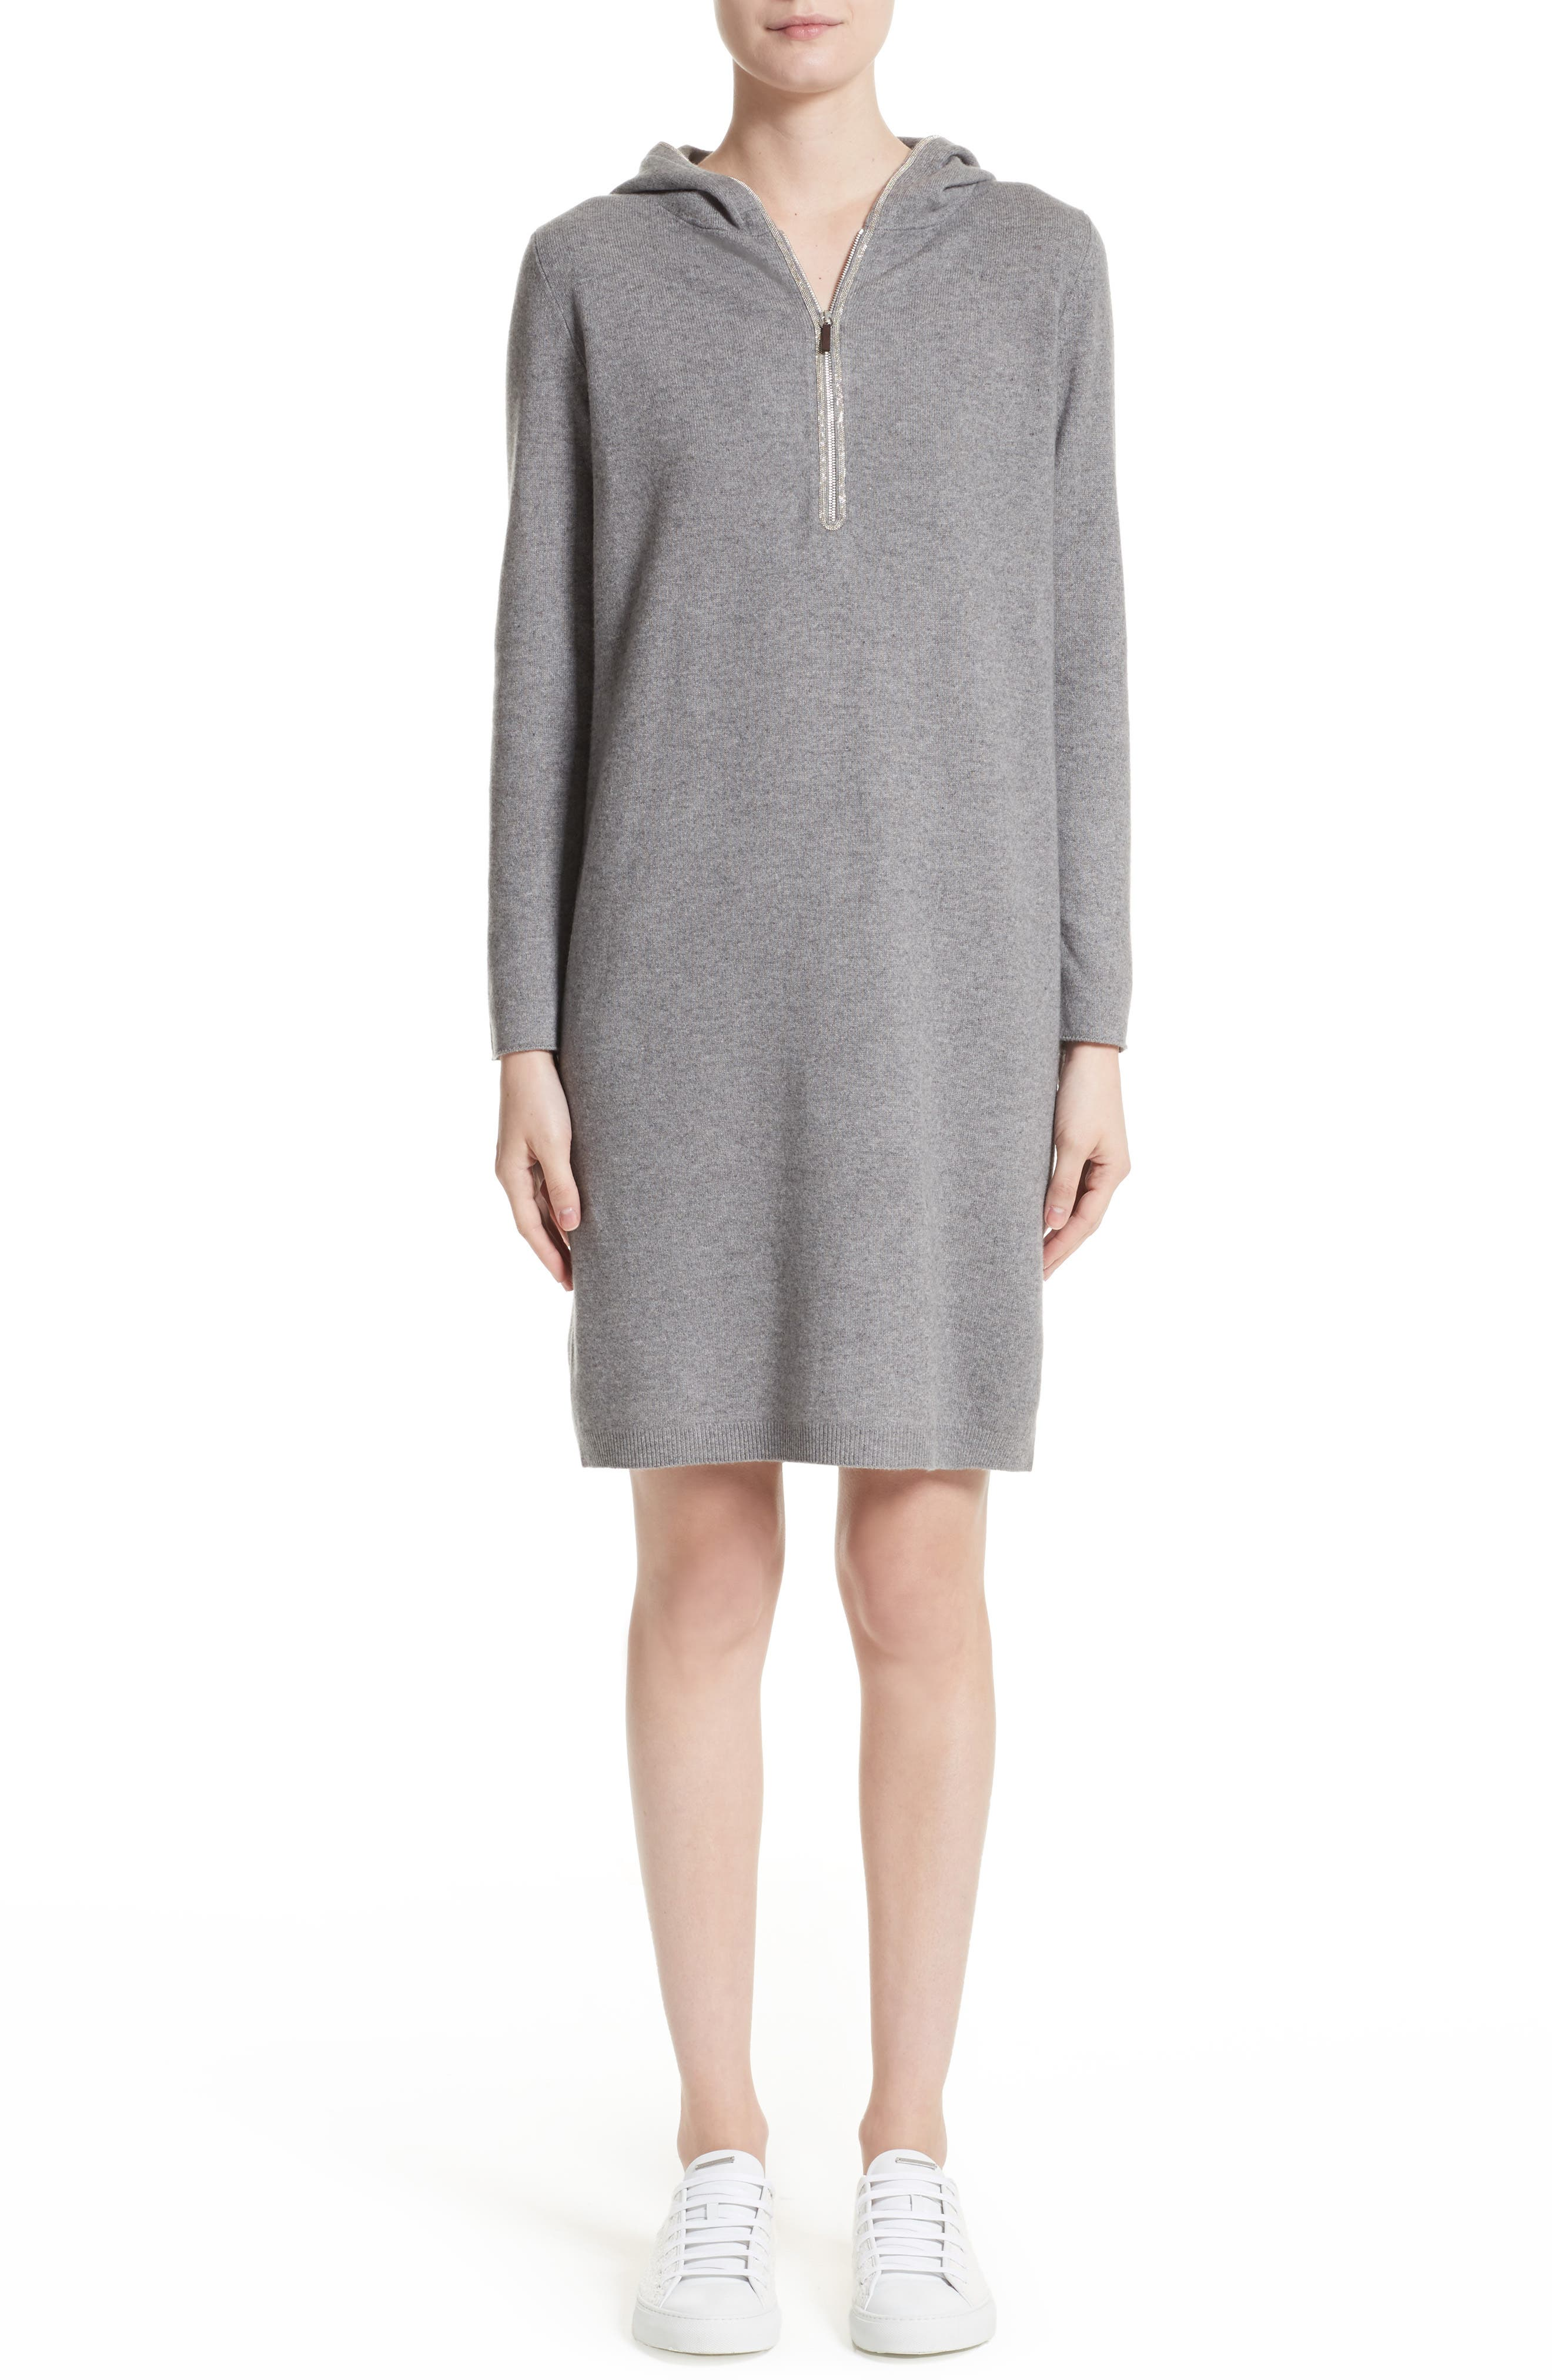 Fabiana Filippi Wool, Silk & Cashmere Hooded Dress